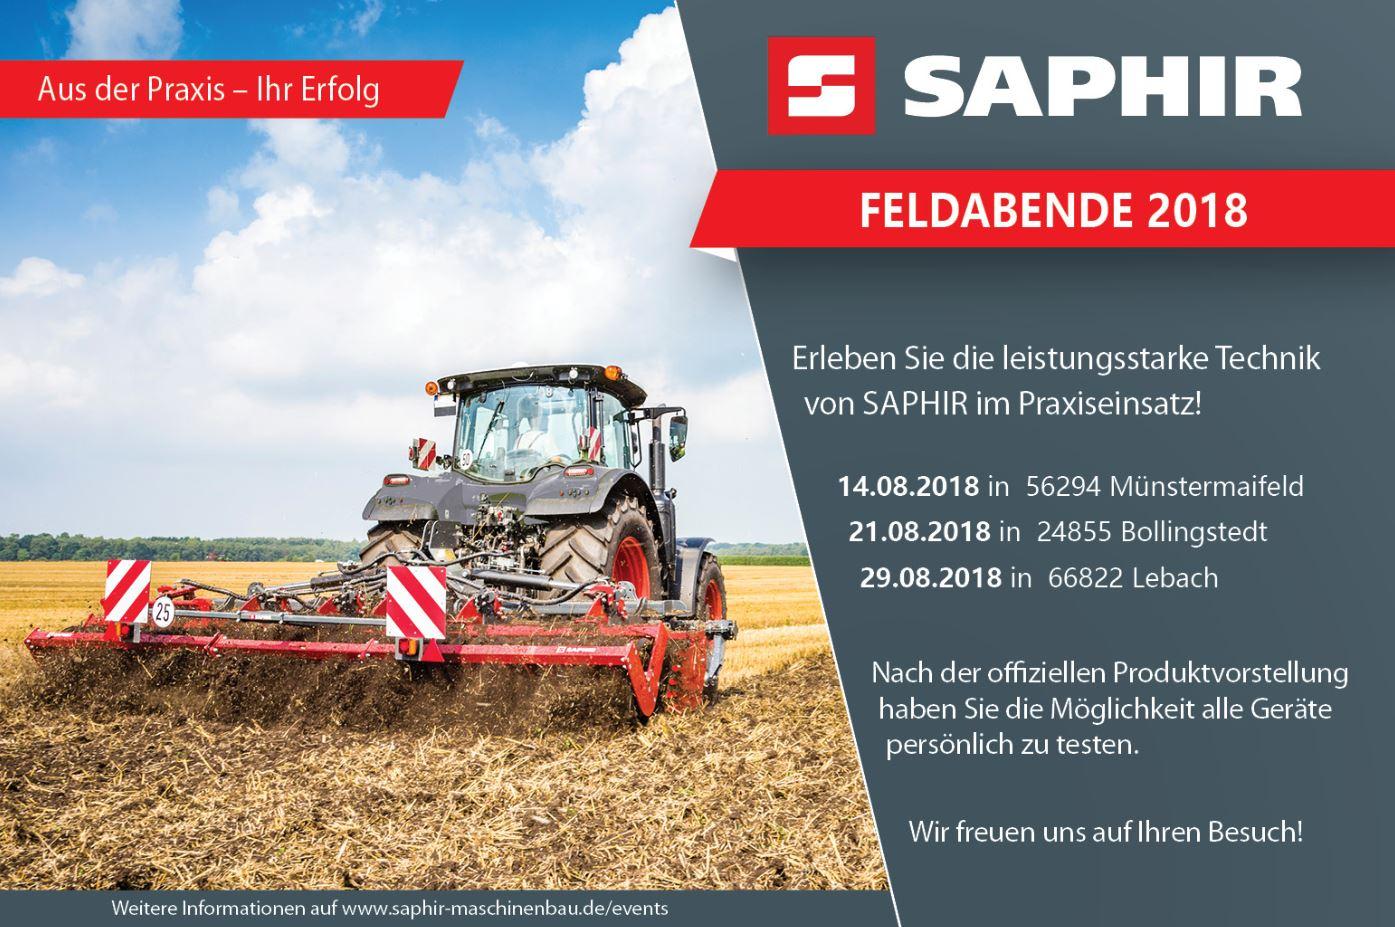 SAPHIR Feldabende 2018